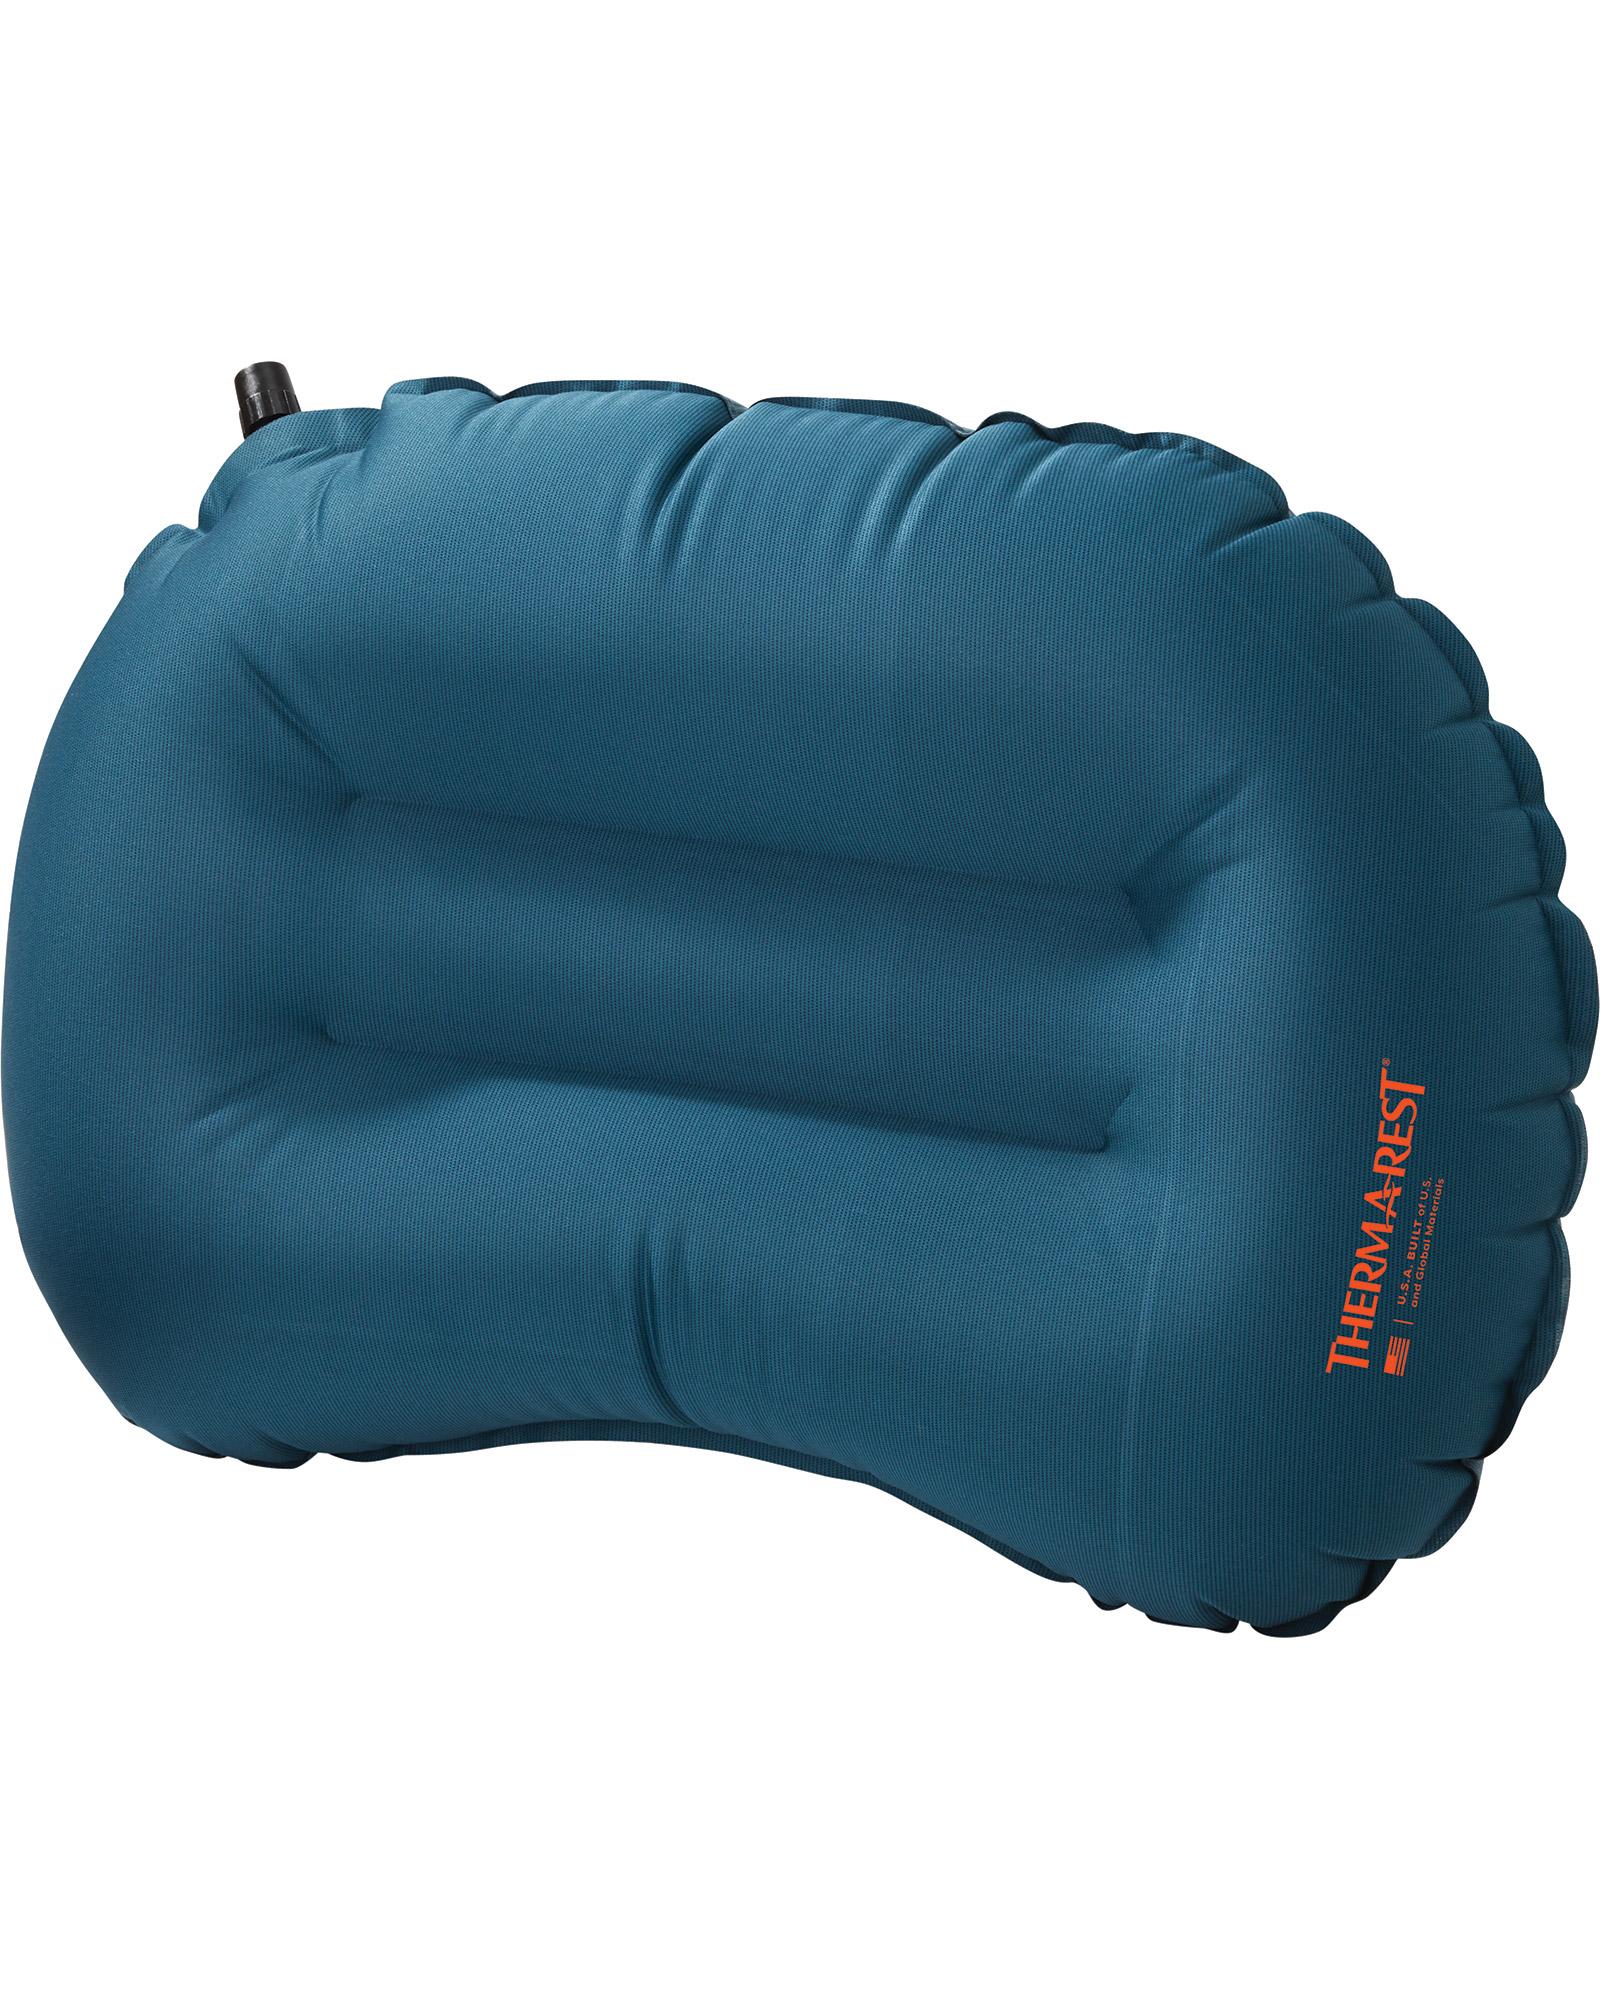 Therm-a-Rest Air Head Lite Pillow 0